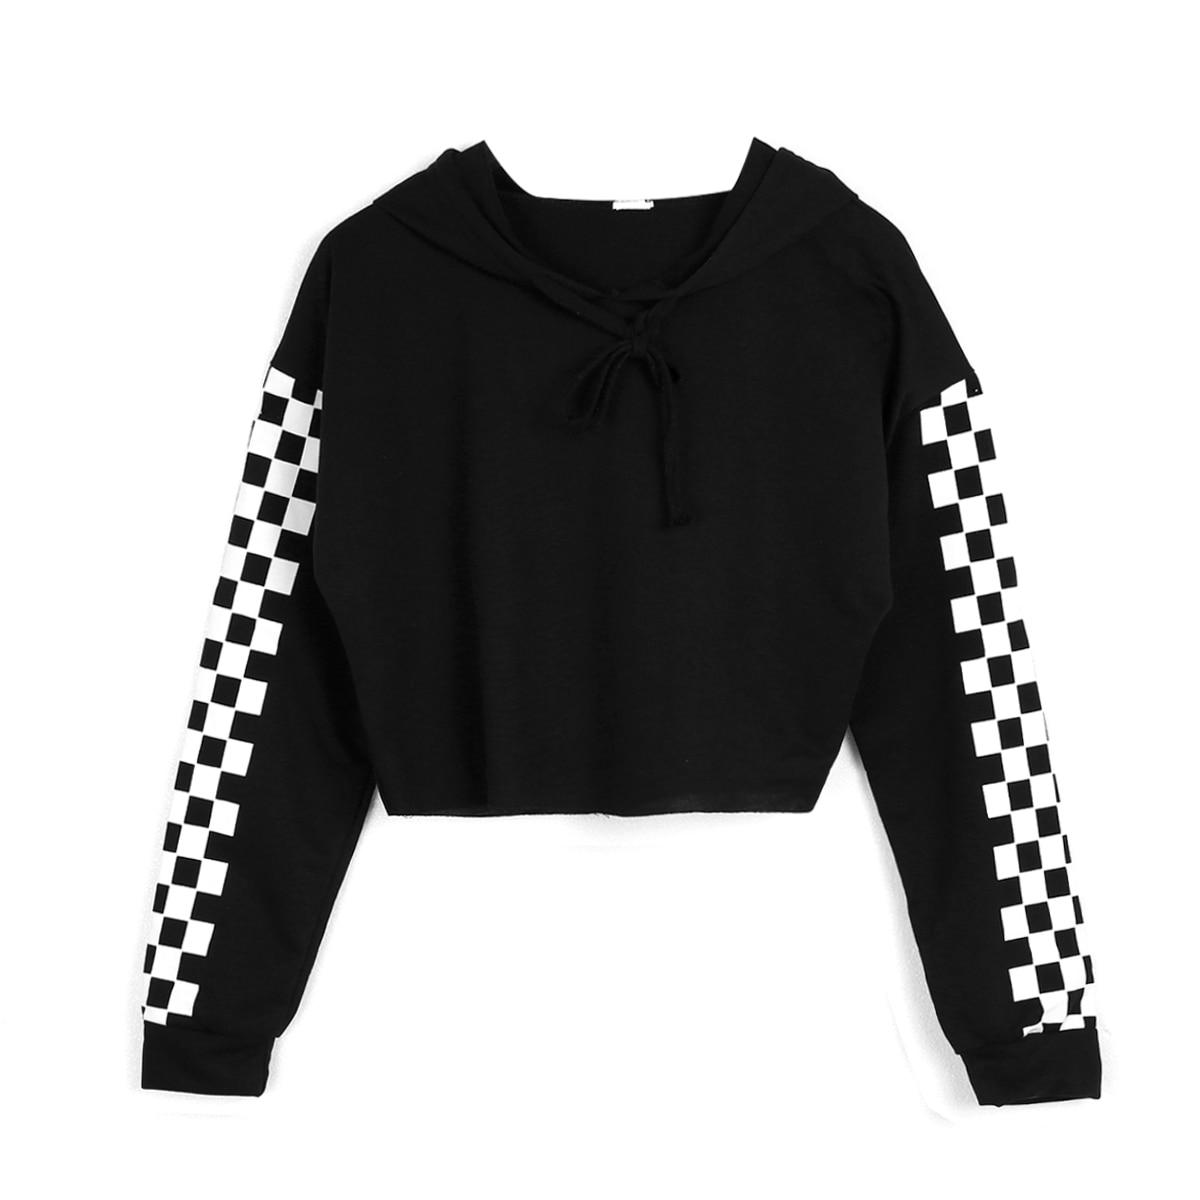 Women's Hoodie Sweatshirt Jumper Crop Top Sports Pullover Plaid Sweatshirts